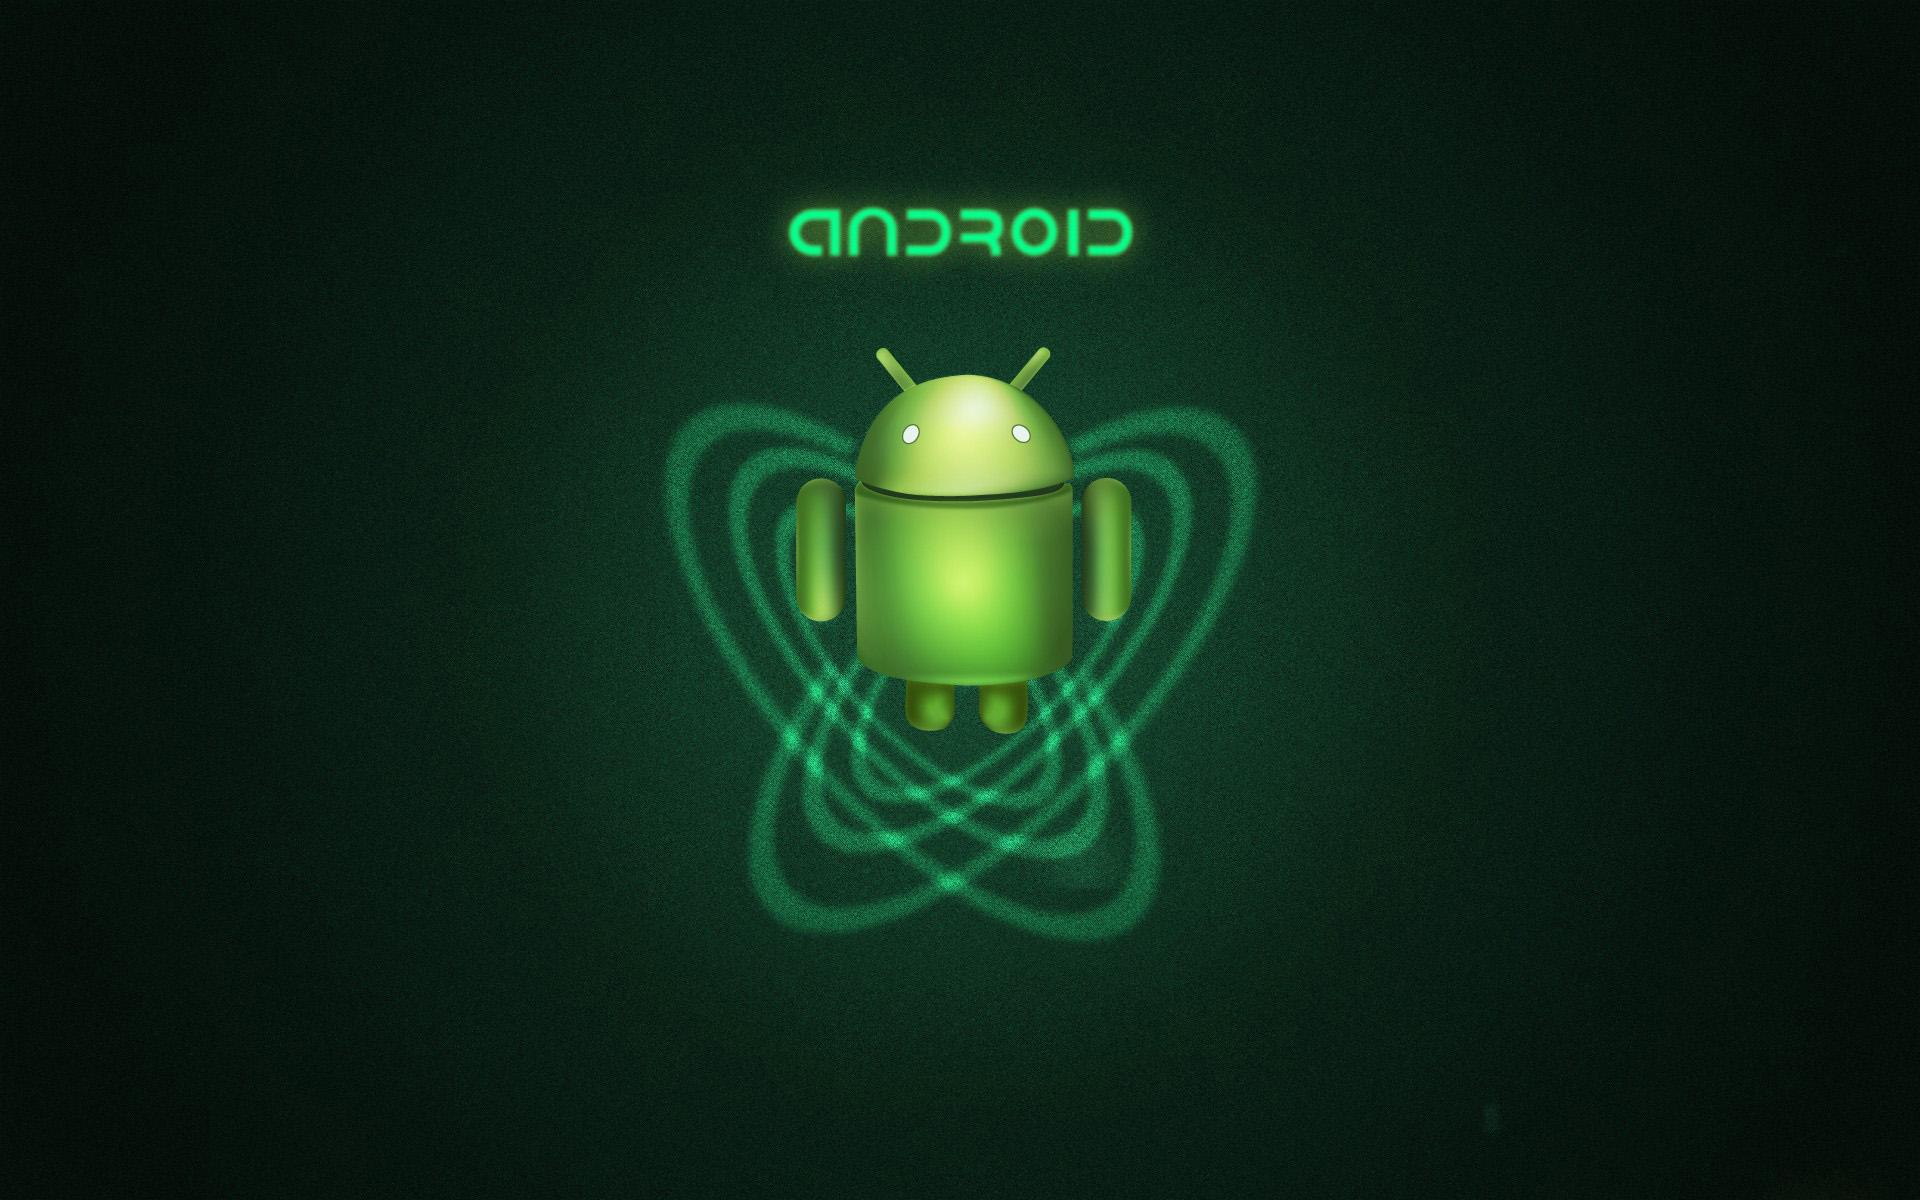 картинки на андроид для заставки